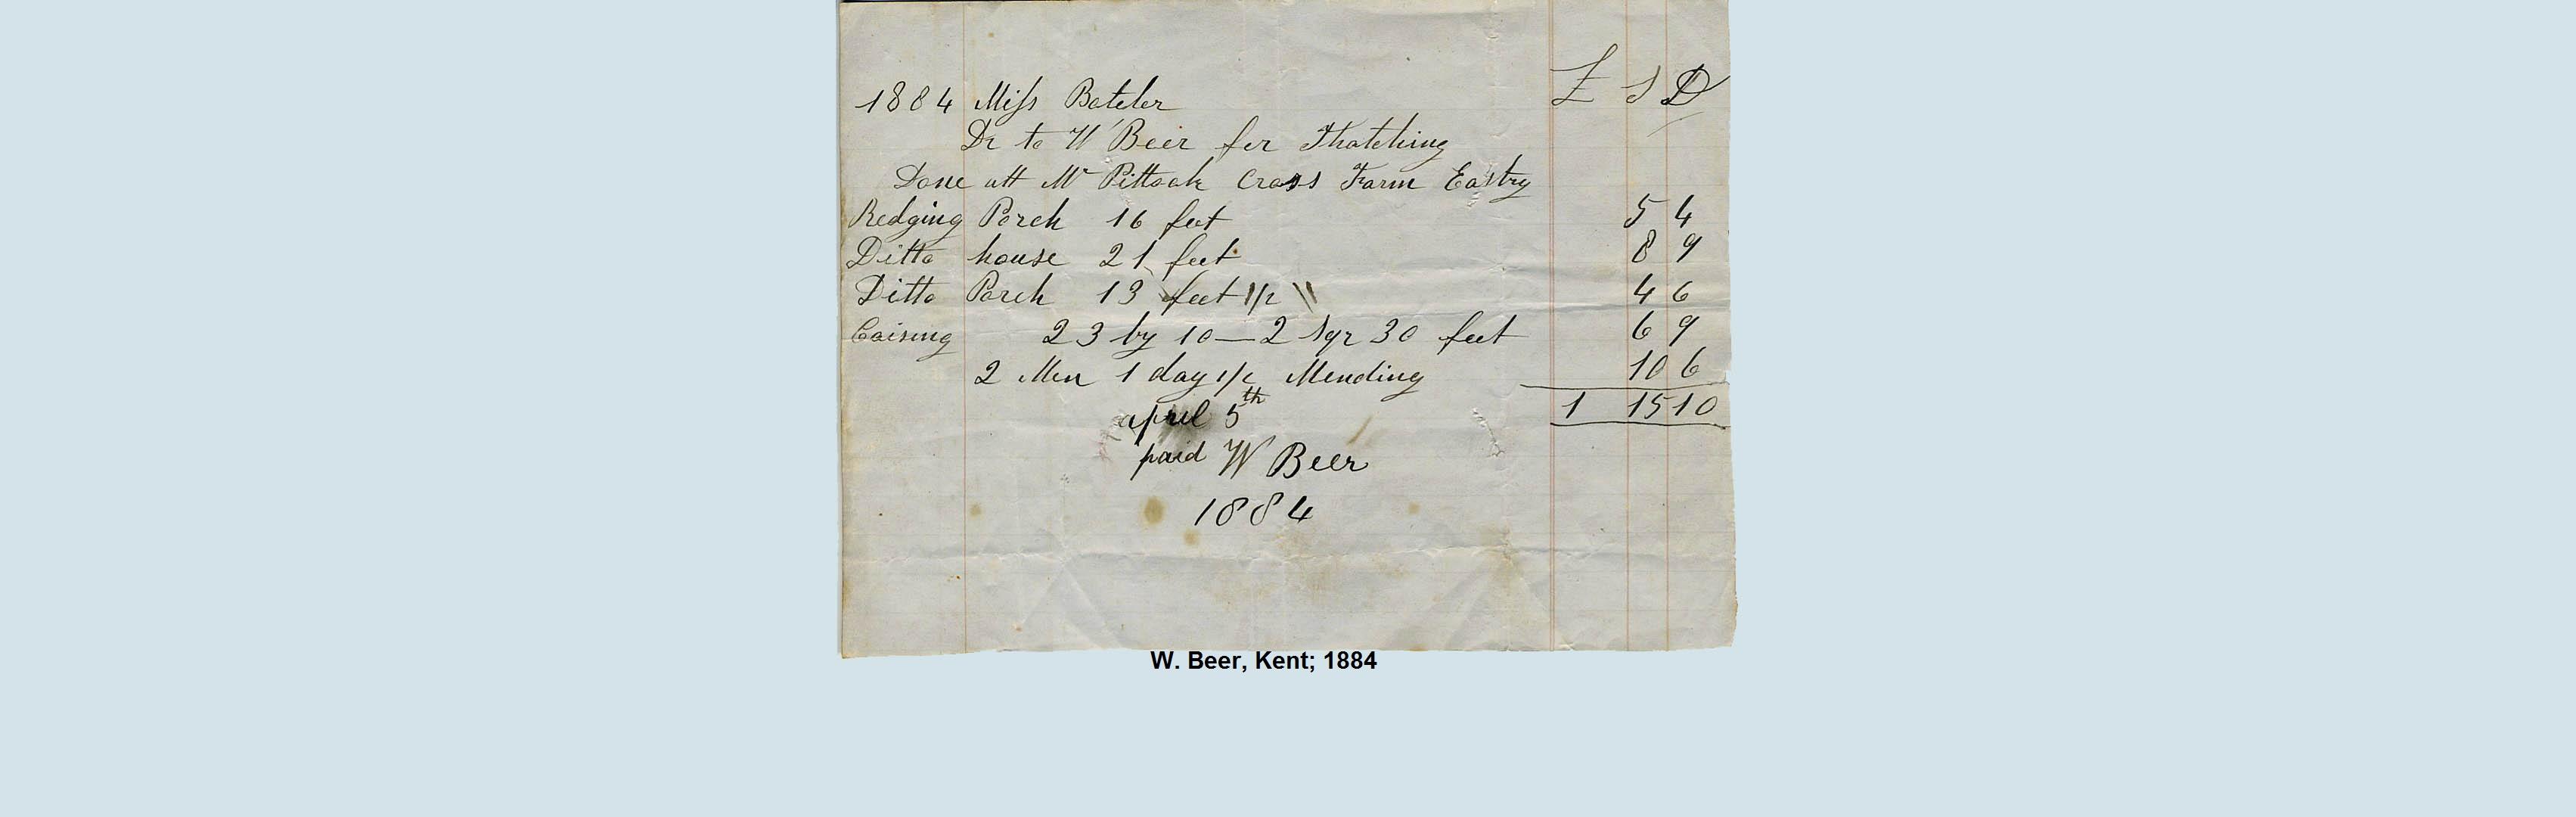 thatch bill 1884